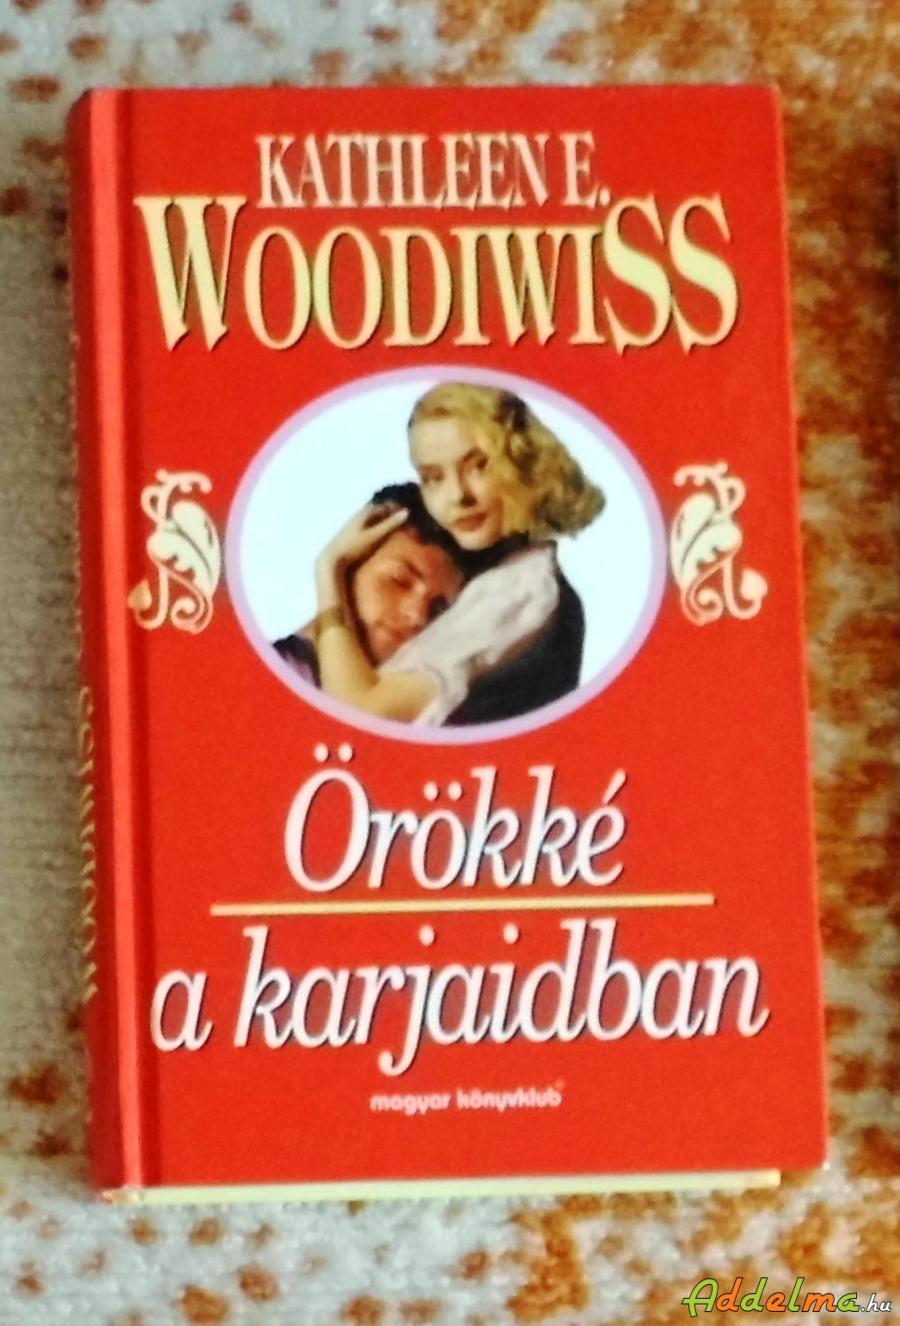 Kathleen E. Woodiwiss - Örökké karjaidban